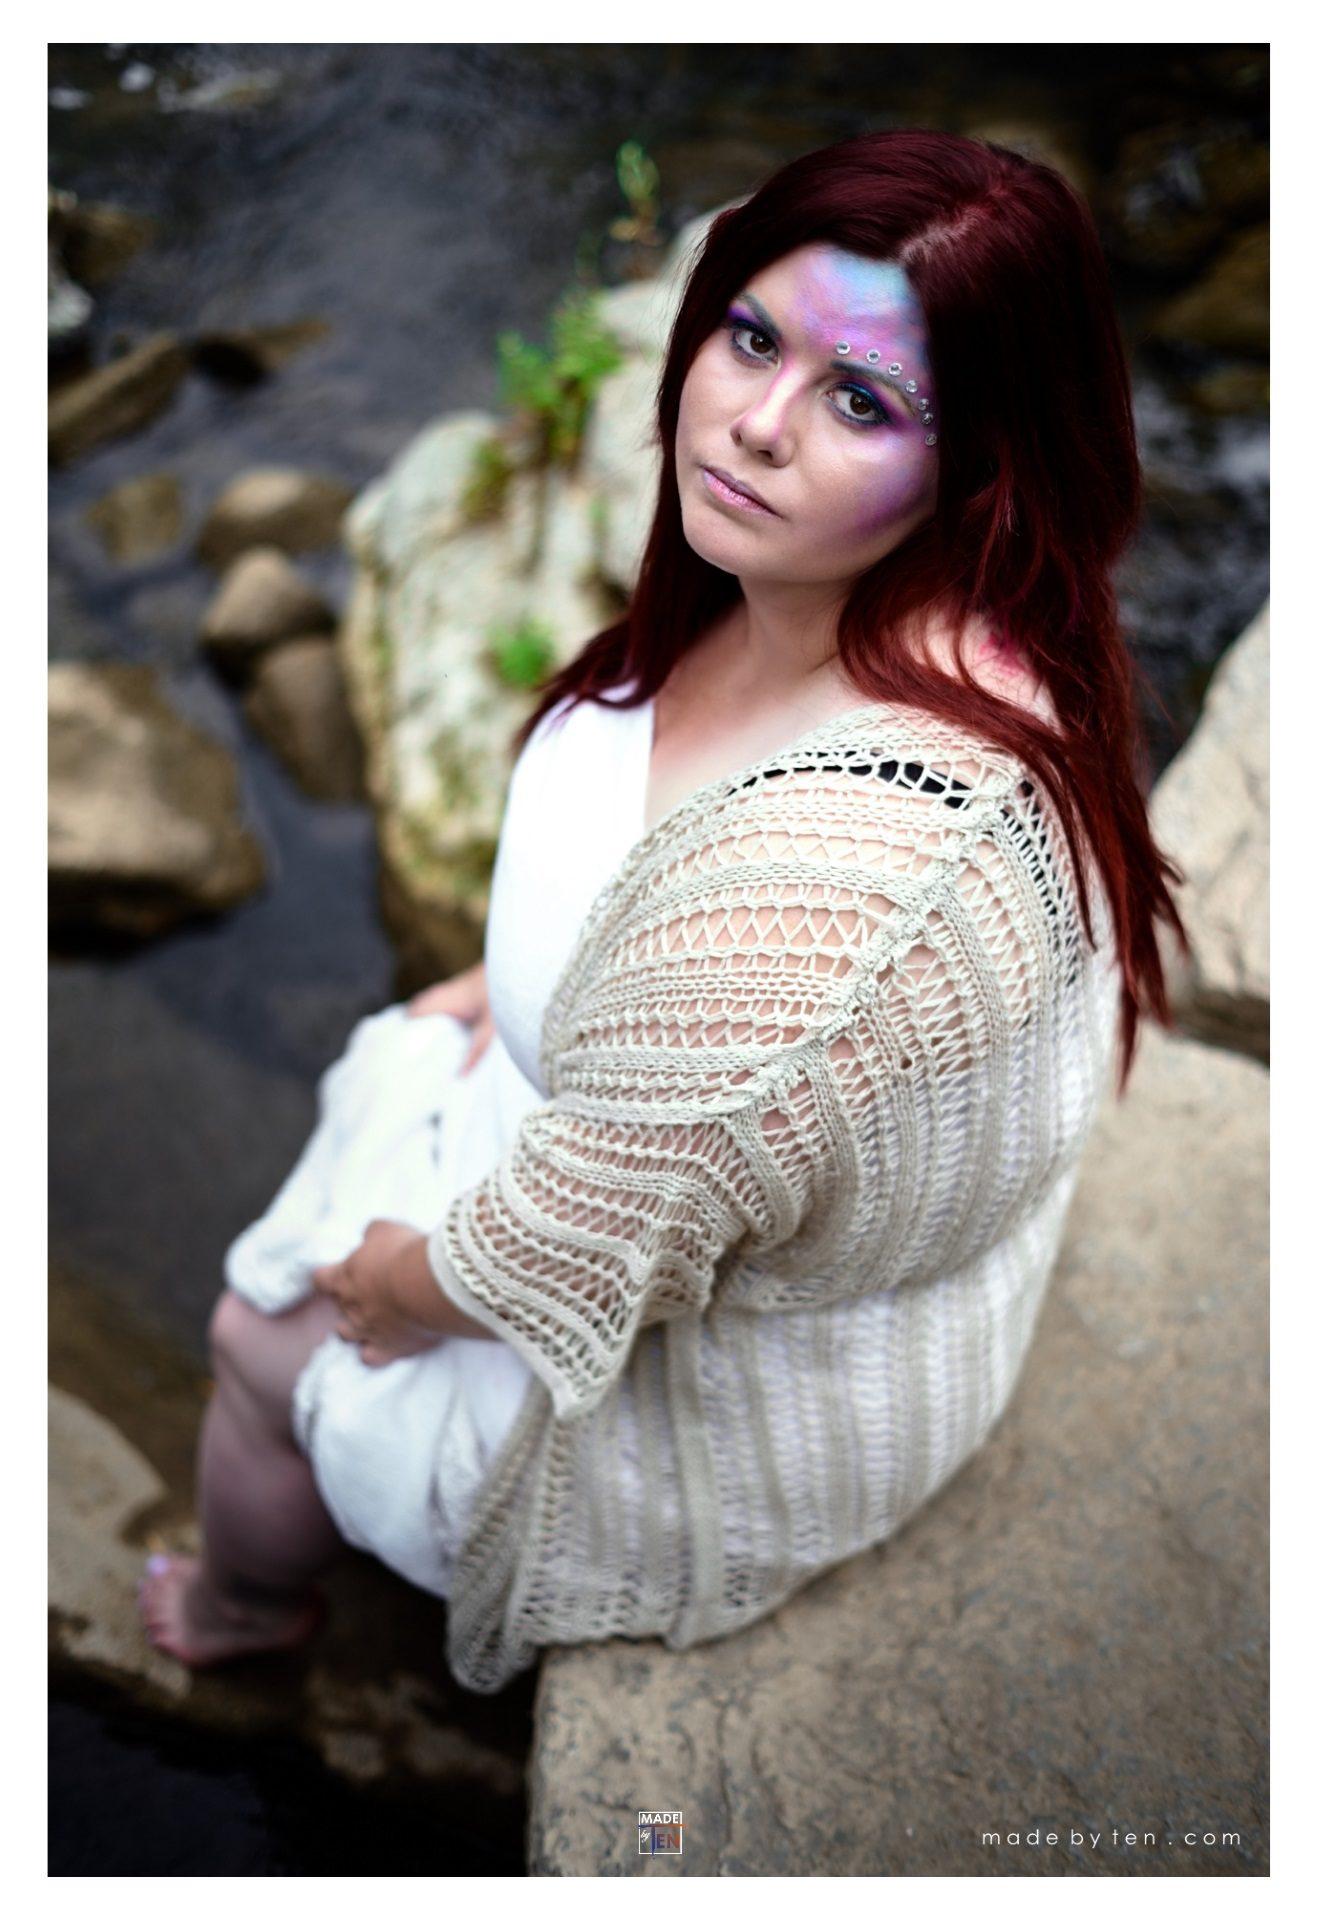 Mermaid Theme - GTA Women Fantasy Photography